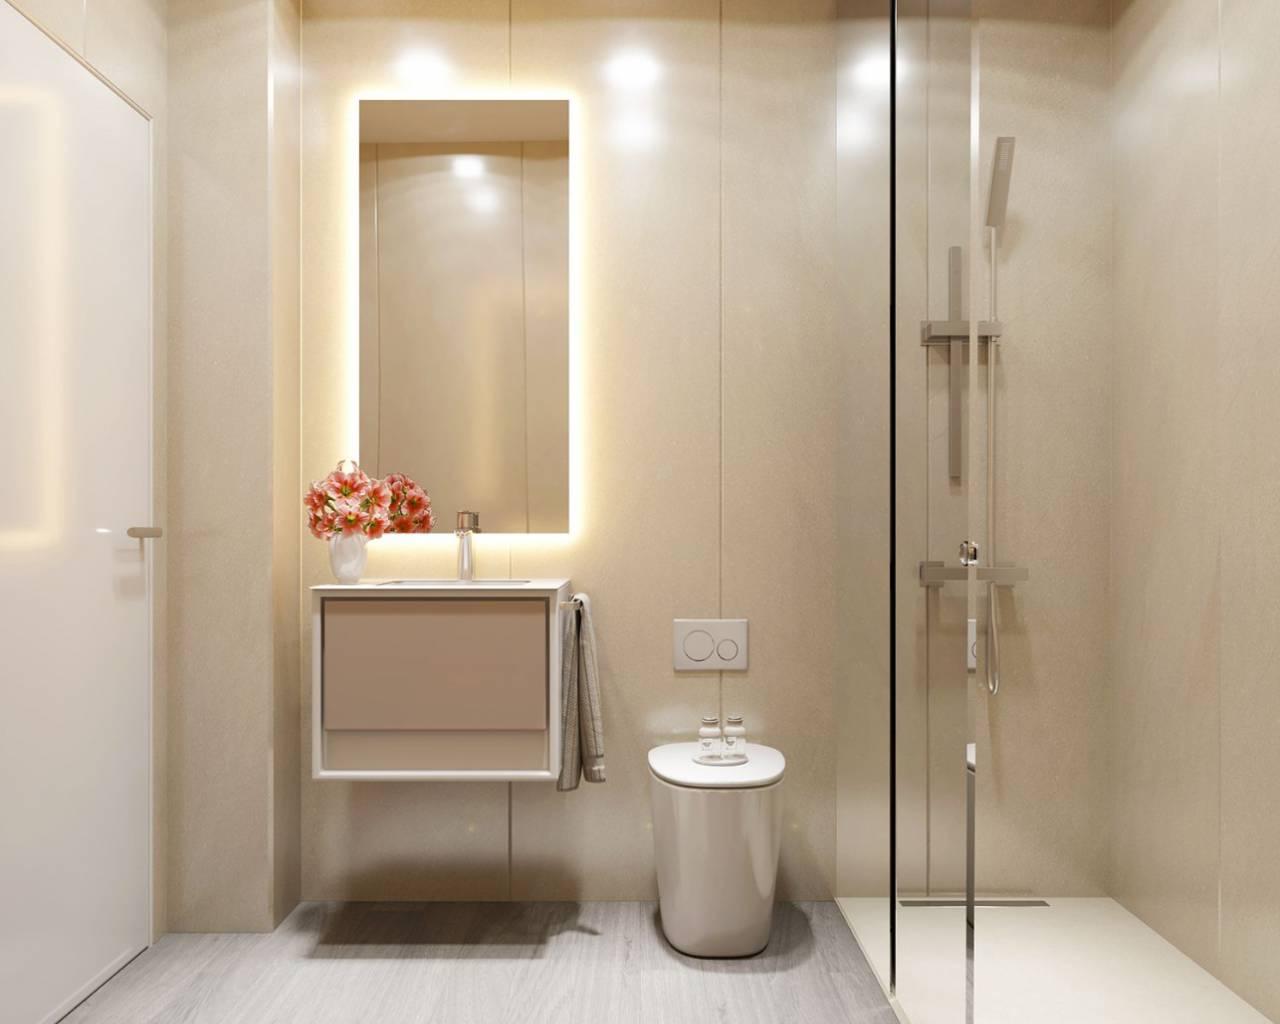 nieuwbouw-appartement-pilar-de-la-horadada_5782_xl